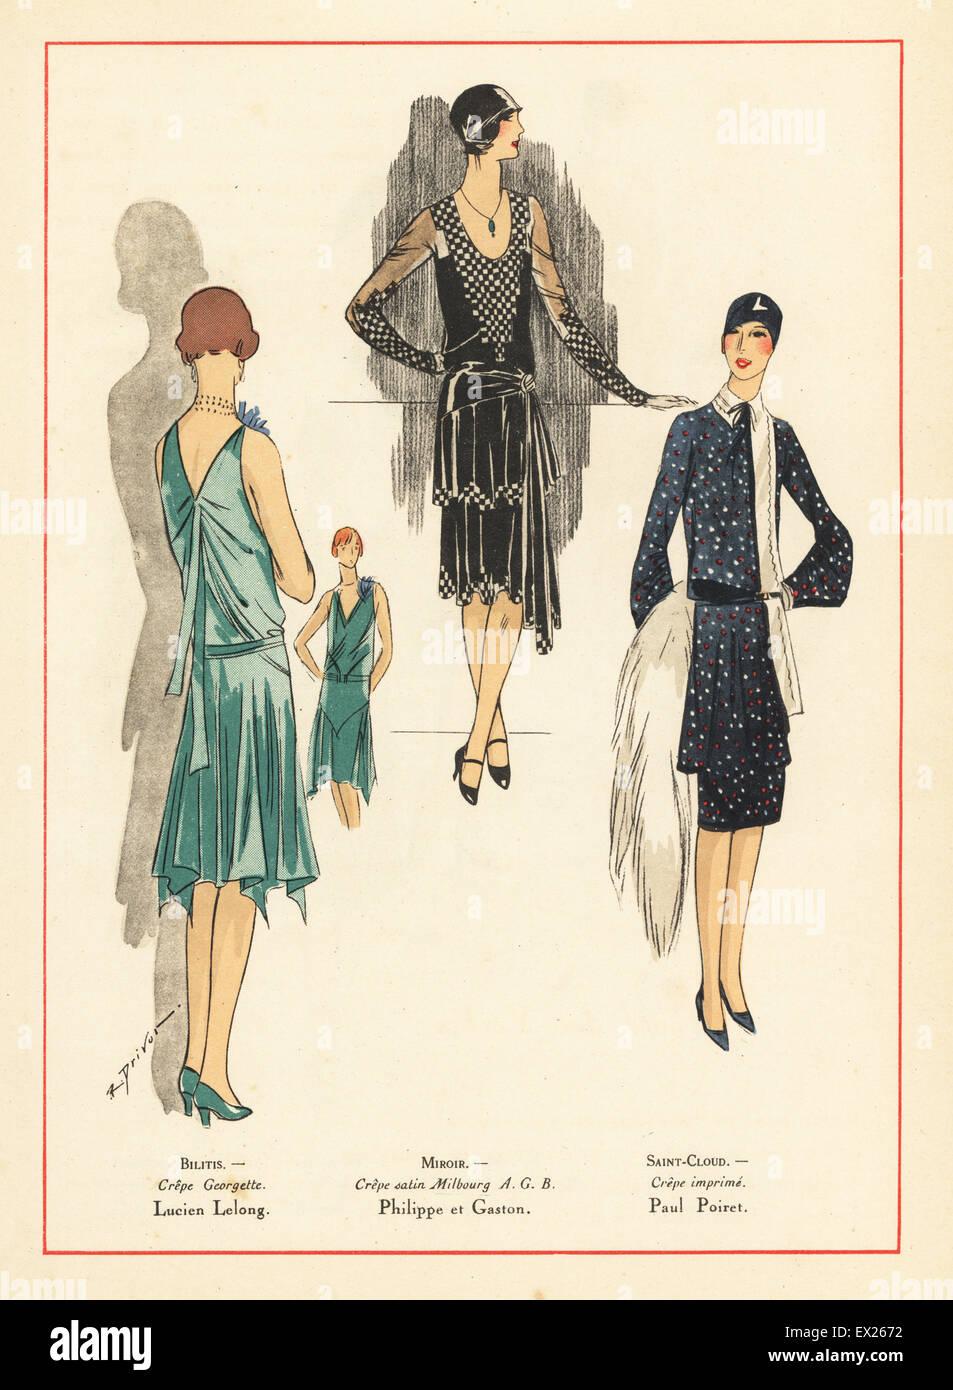 Fashion Illustration 1920s Stockfotos & Fashion Illustration 1920s ...